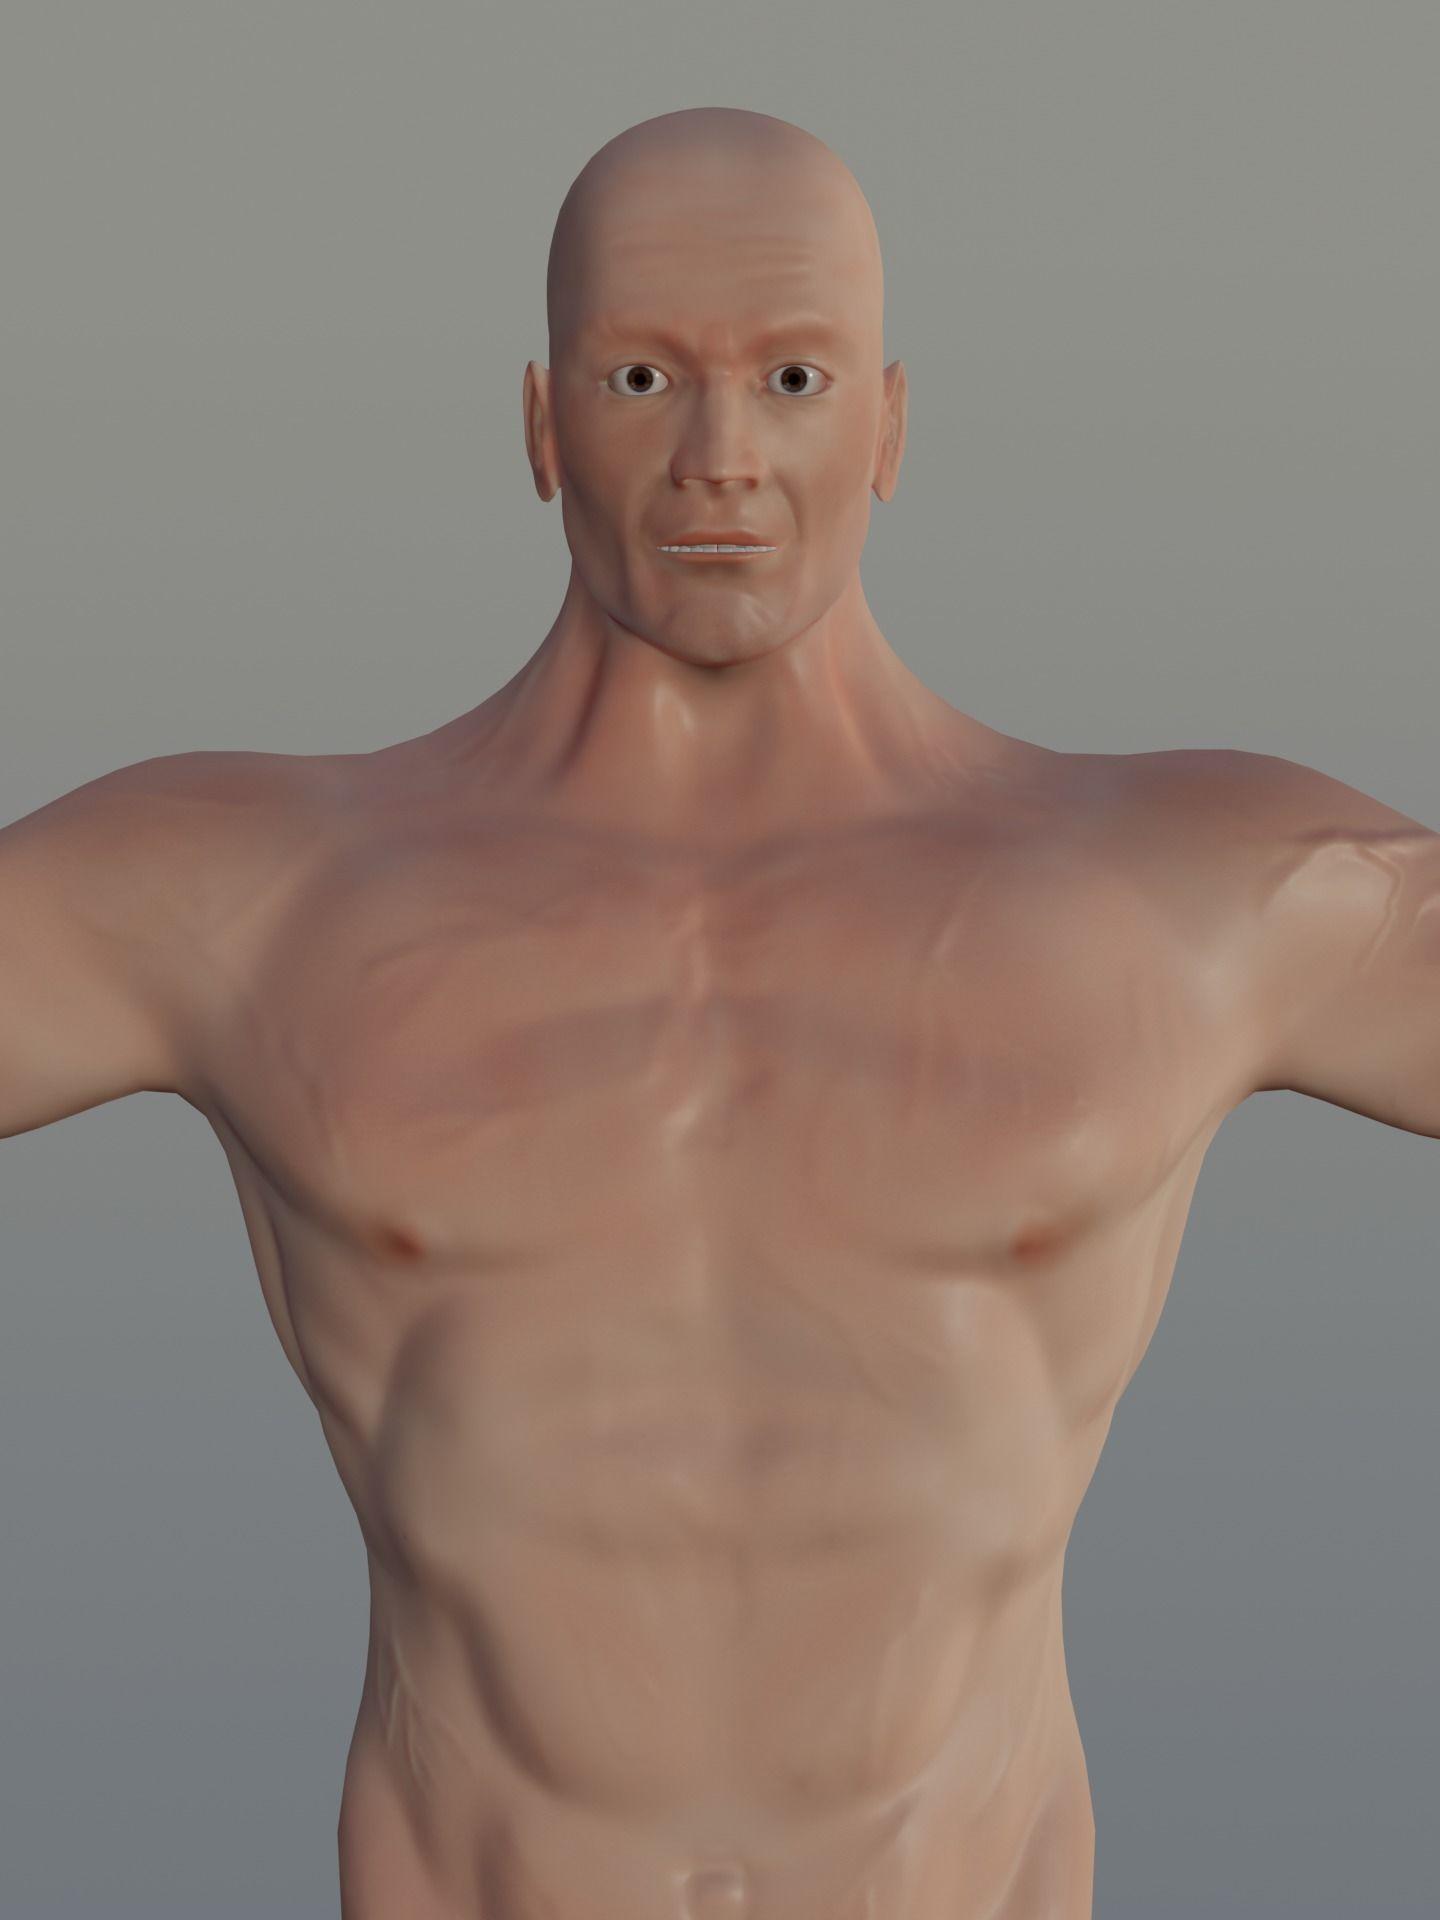 Human Basic Model - Muscular